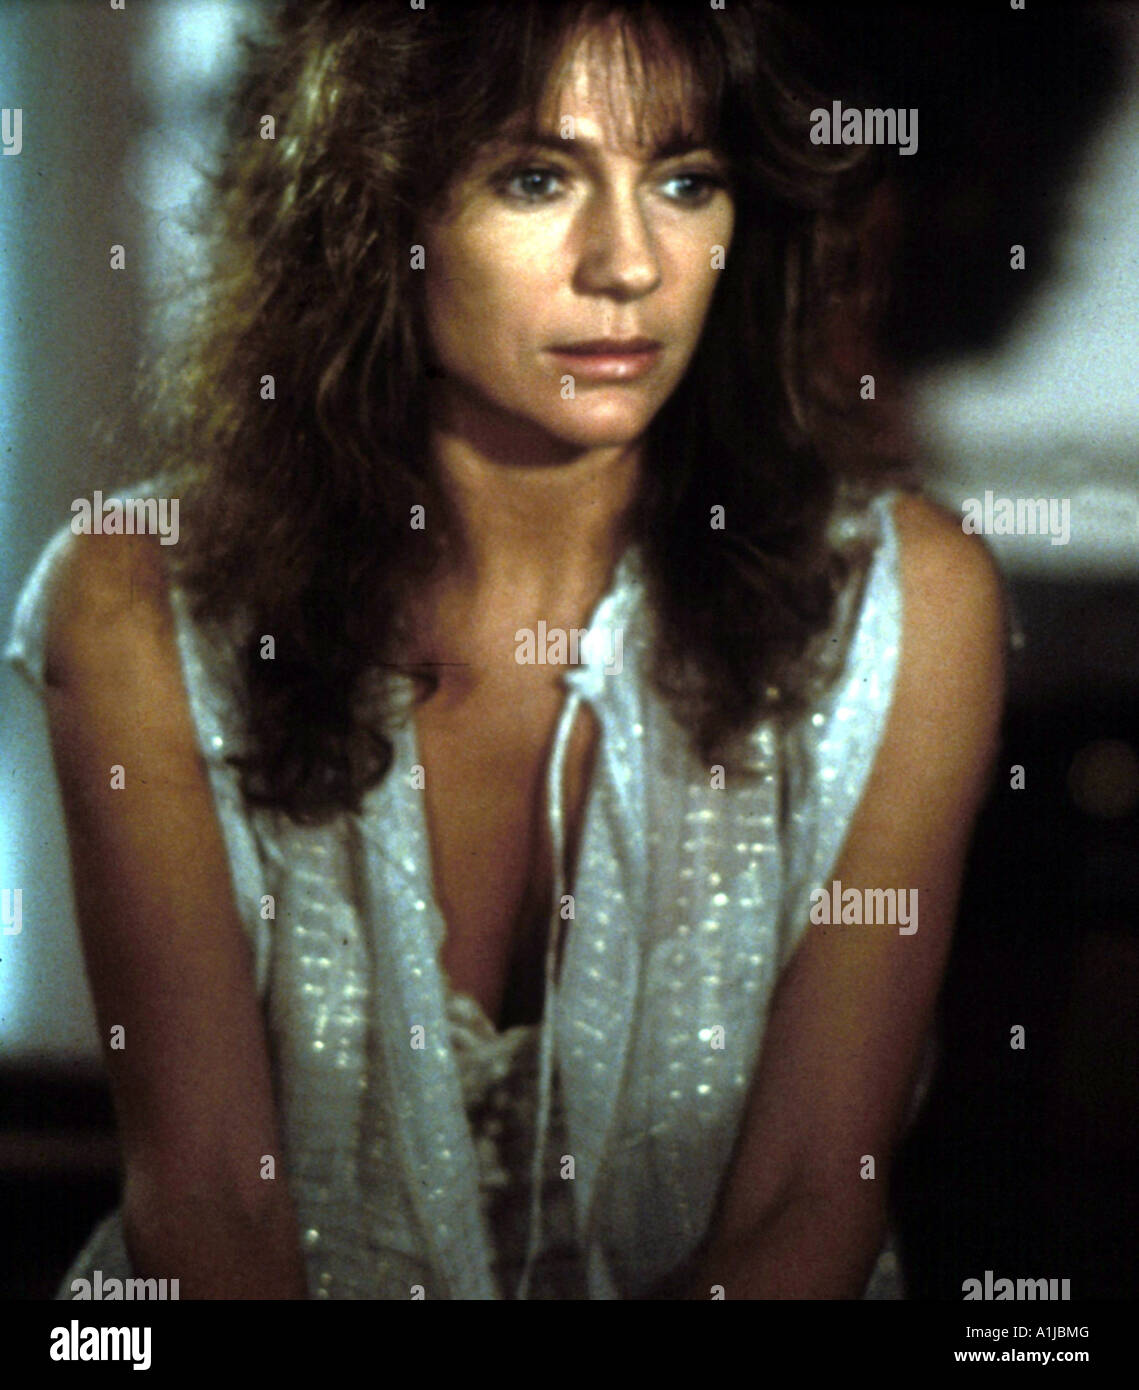 Class Year 1983 Director Lewis John Carlino Jacqueline Bisset - Stock Image